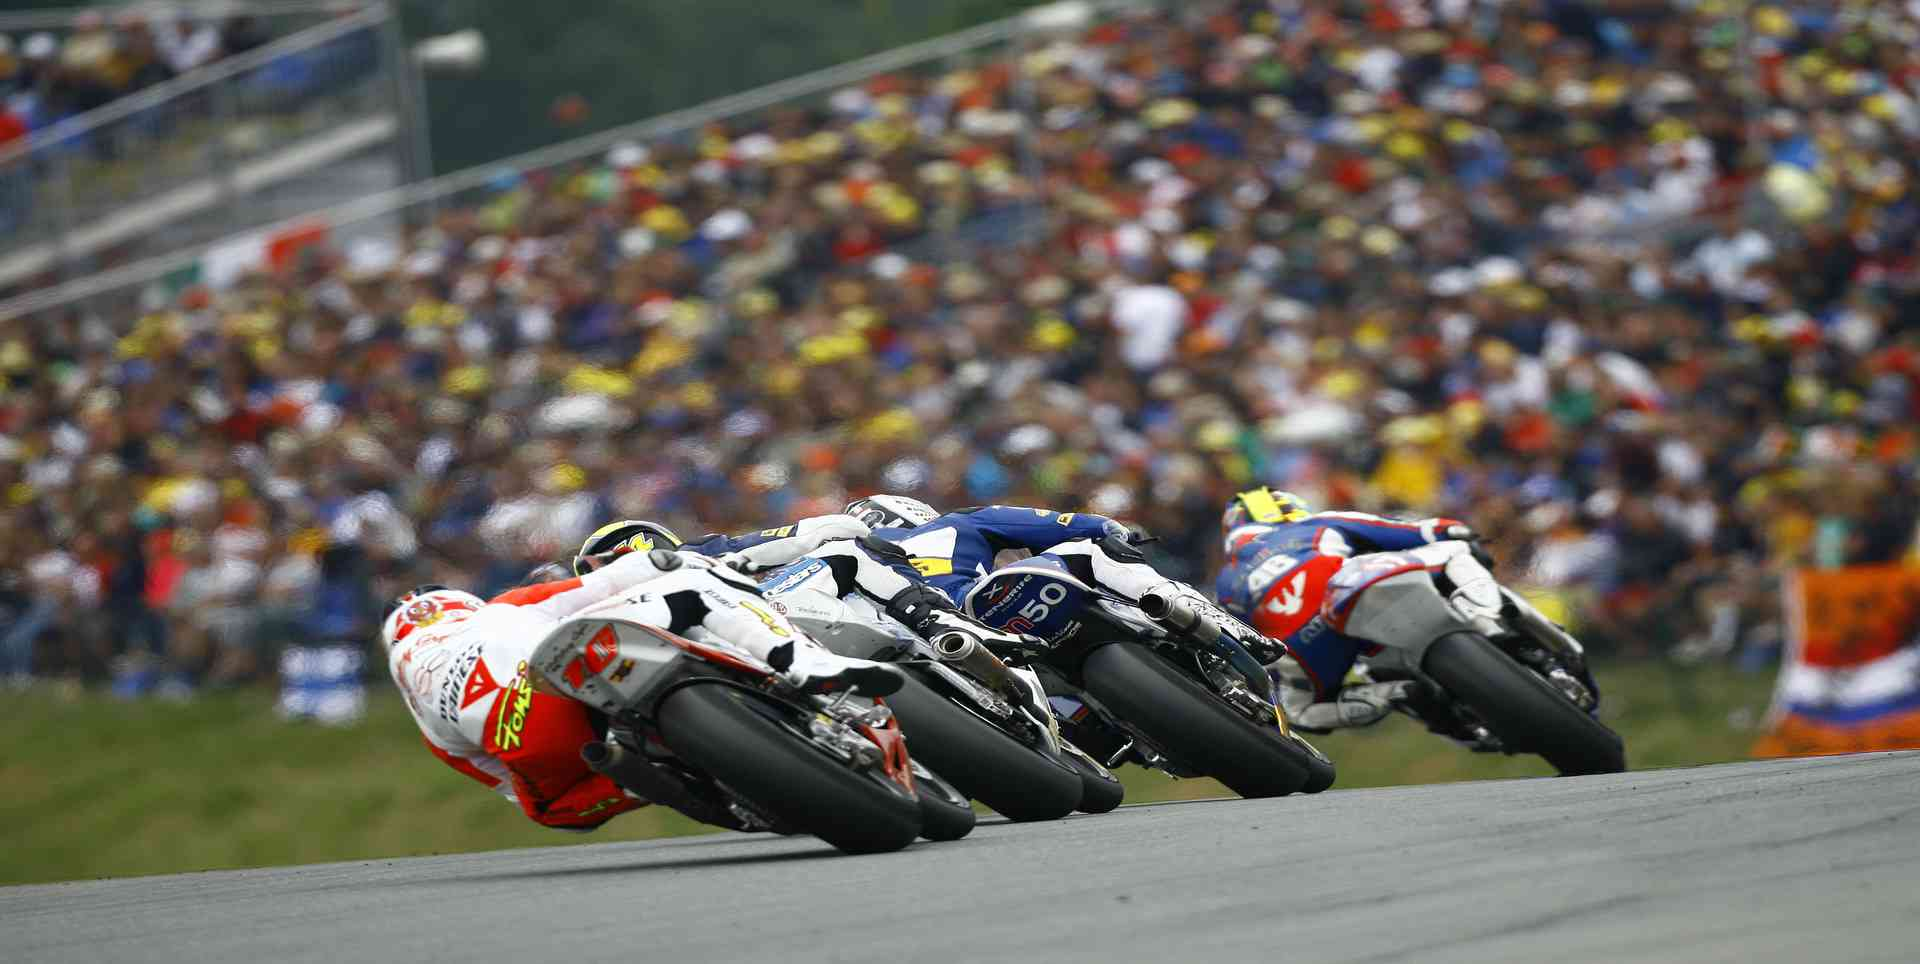 watch-motoamerica-round-1-race-at-austin-live-broadcast